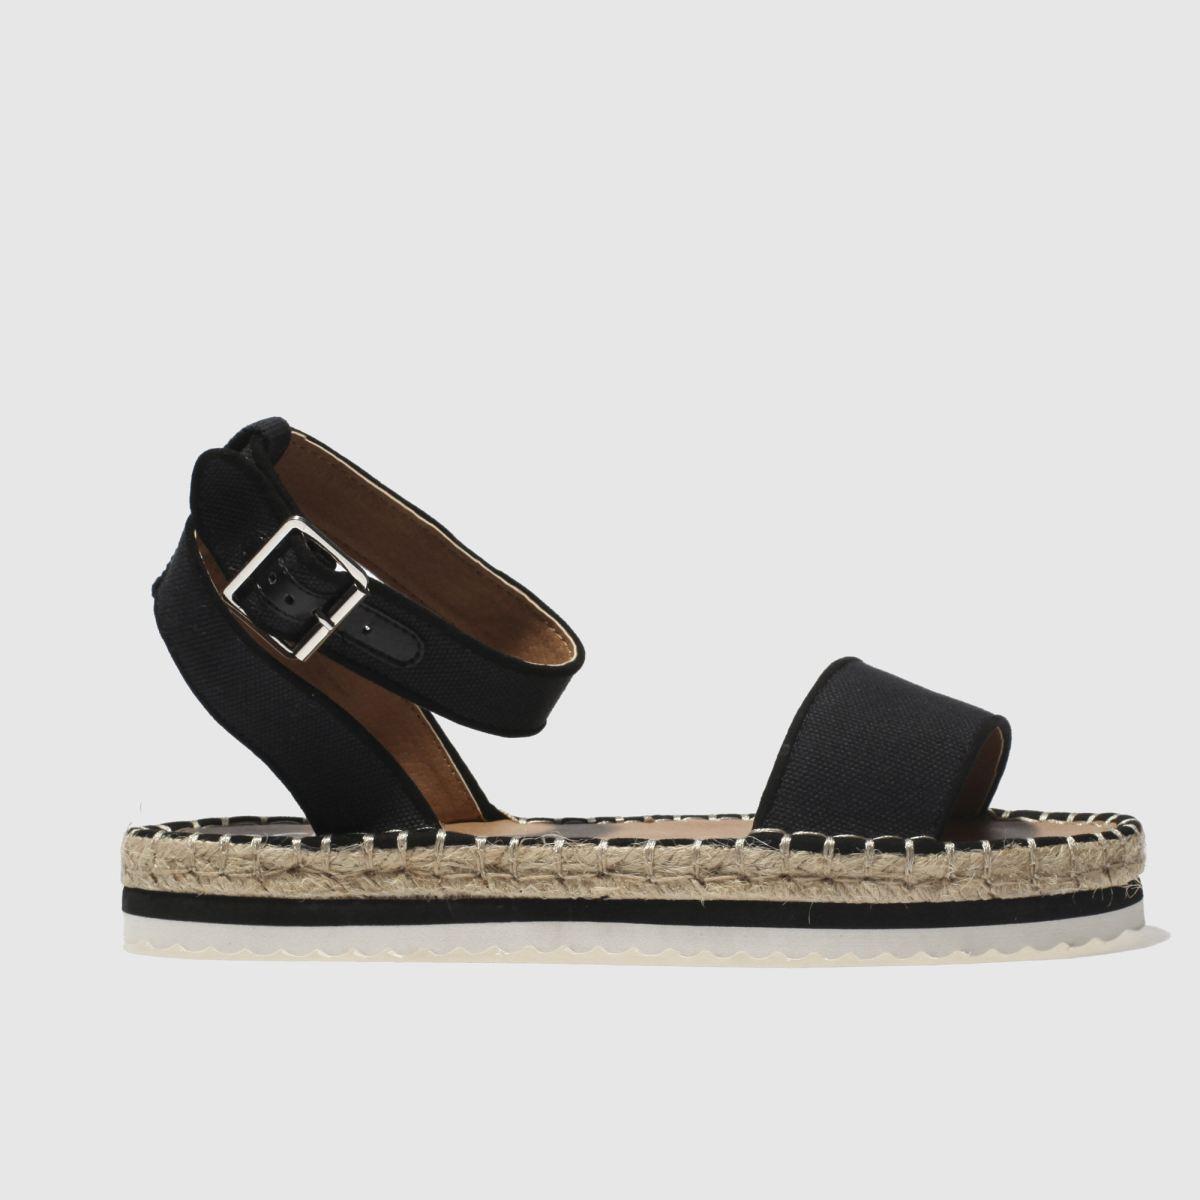 Schuh Black Holiyay Sandals